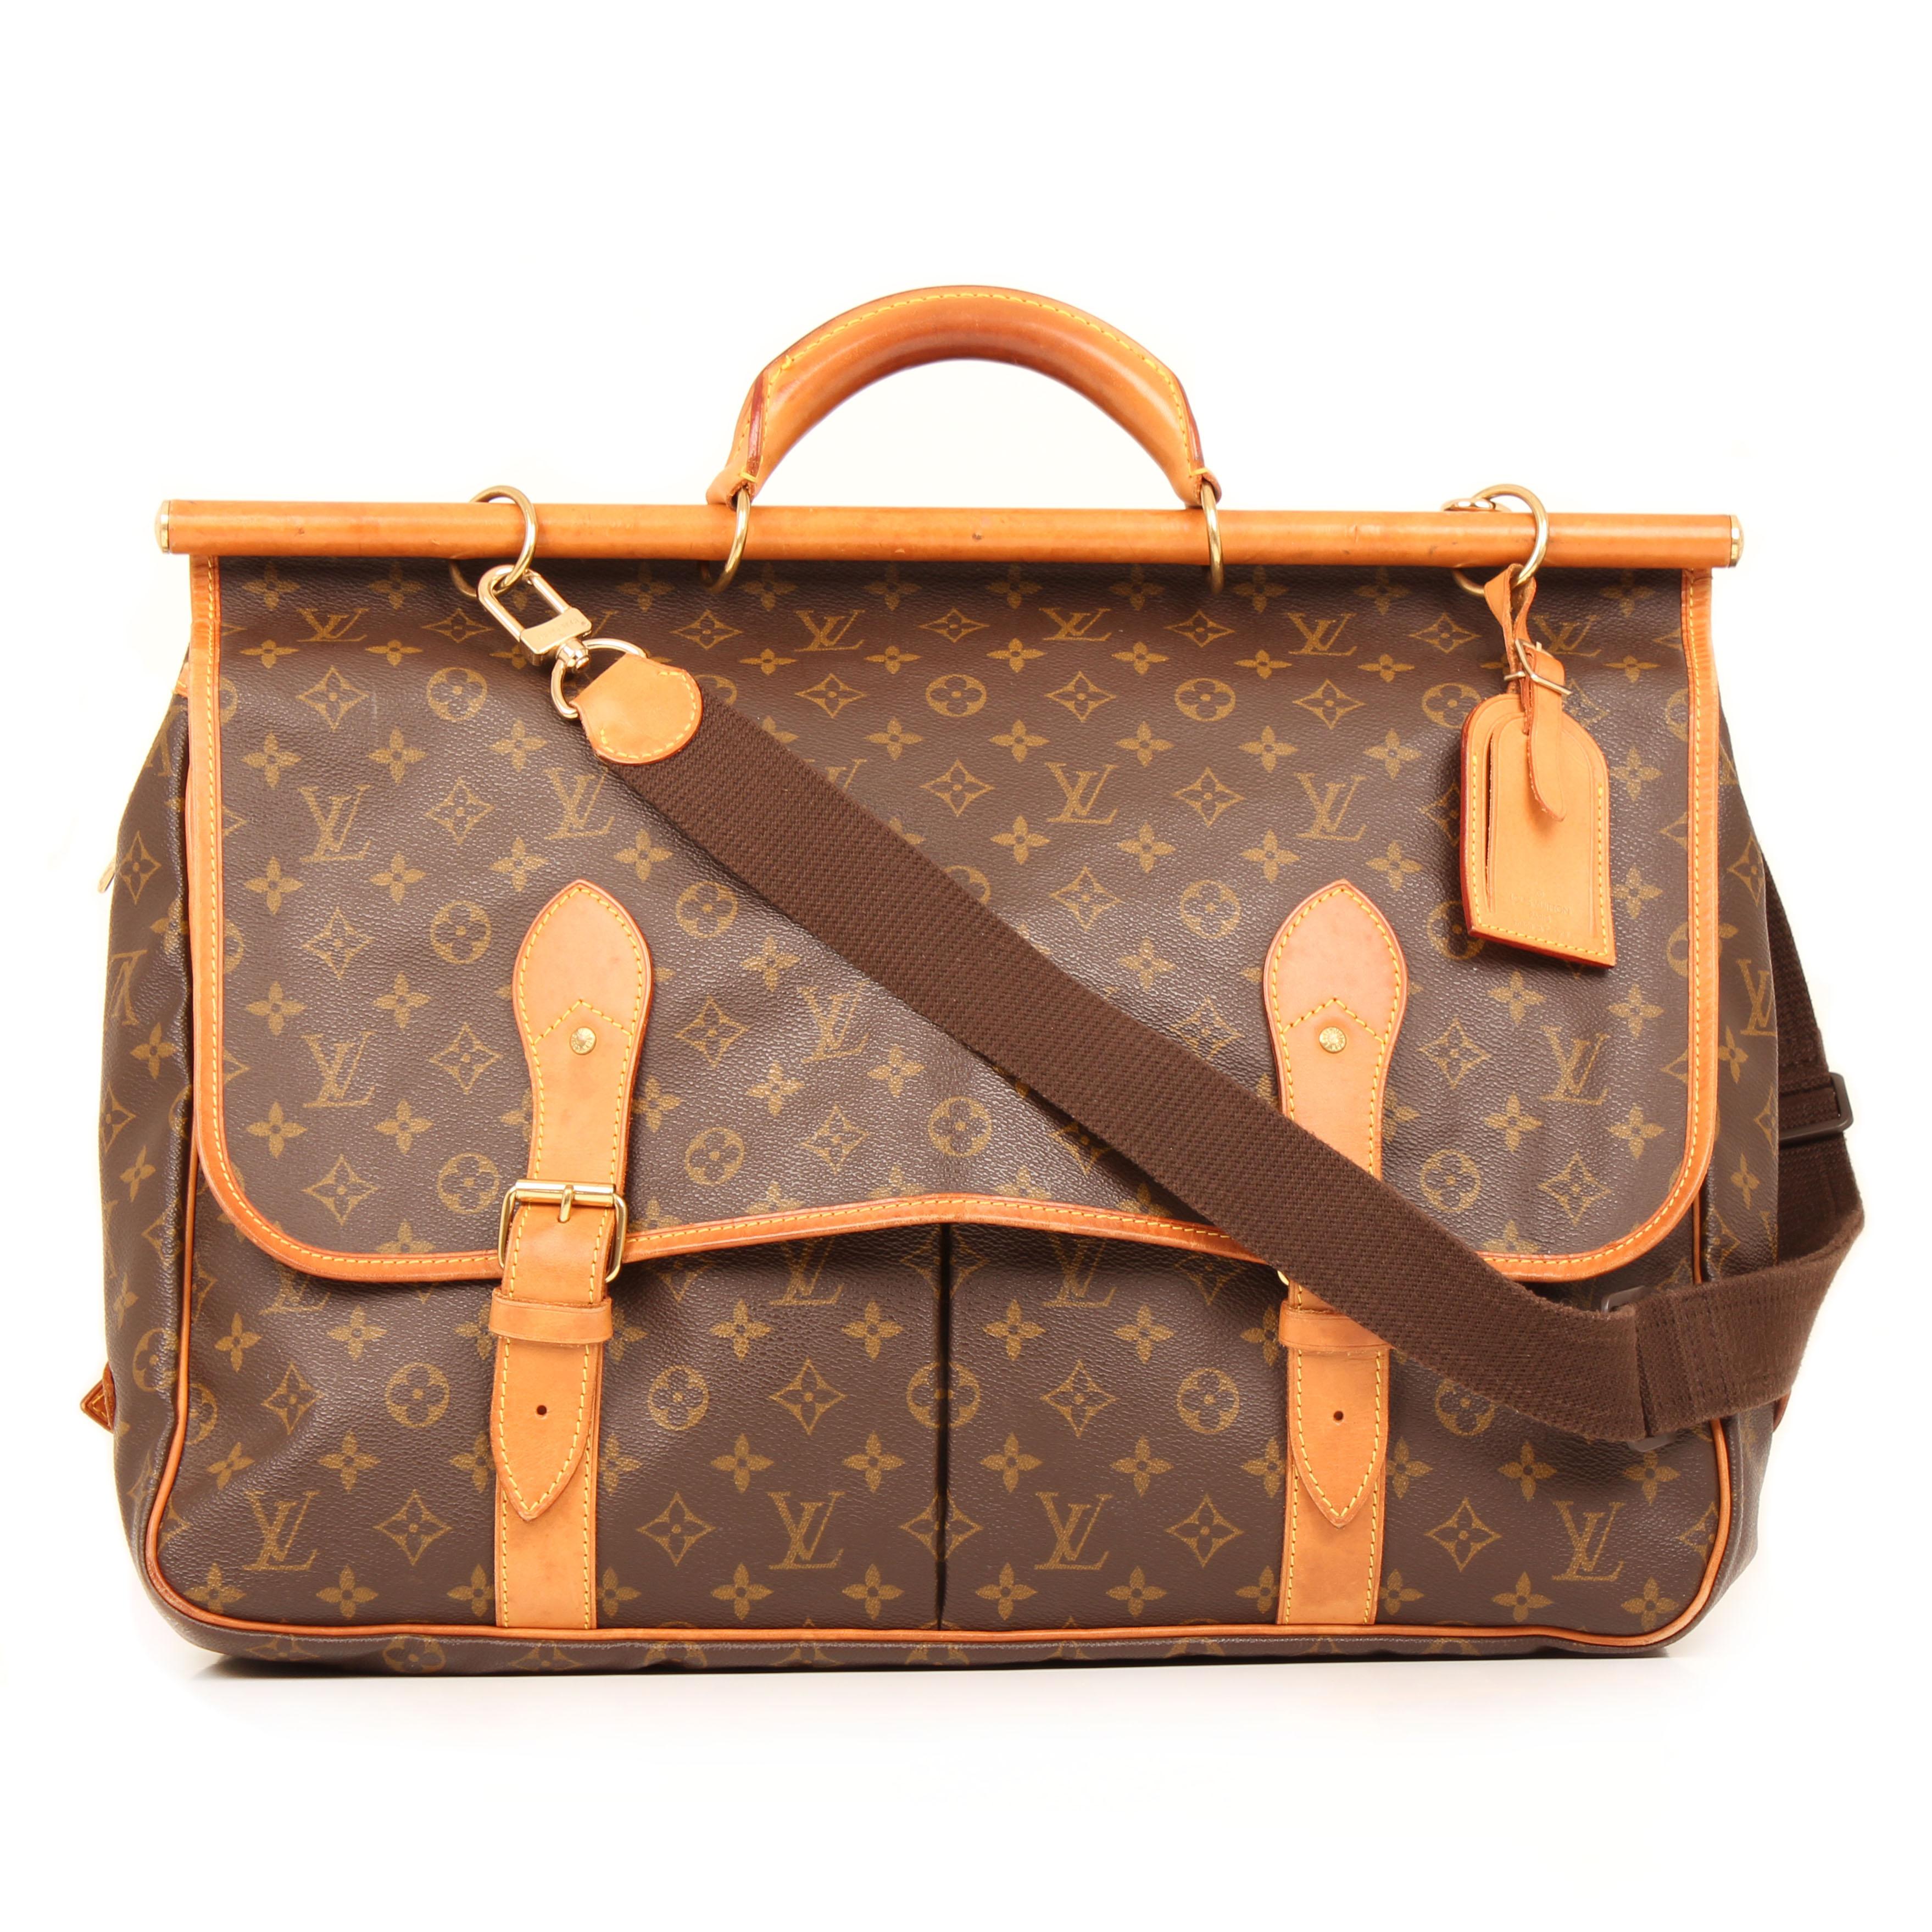 bolsa de viaje louis vuitton sac chasse monogram trasera